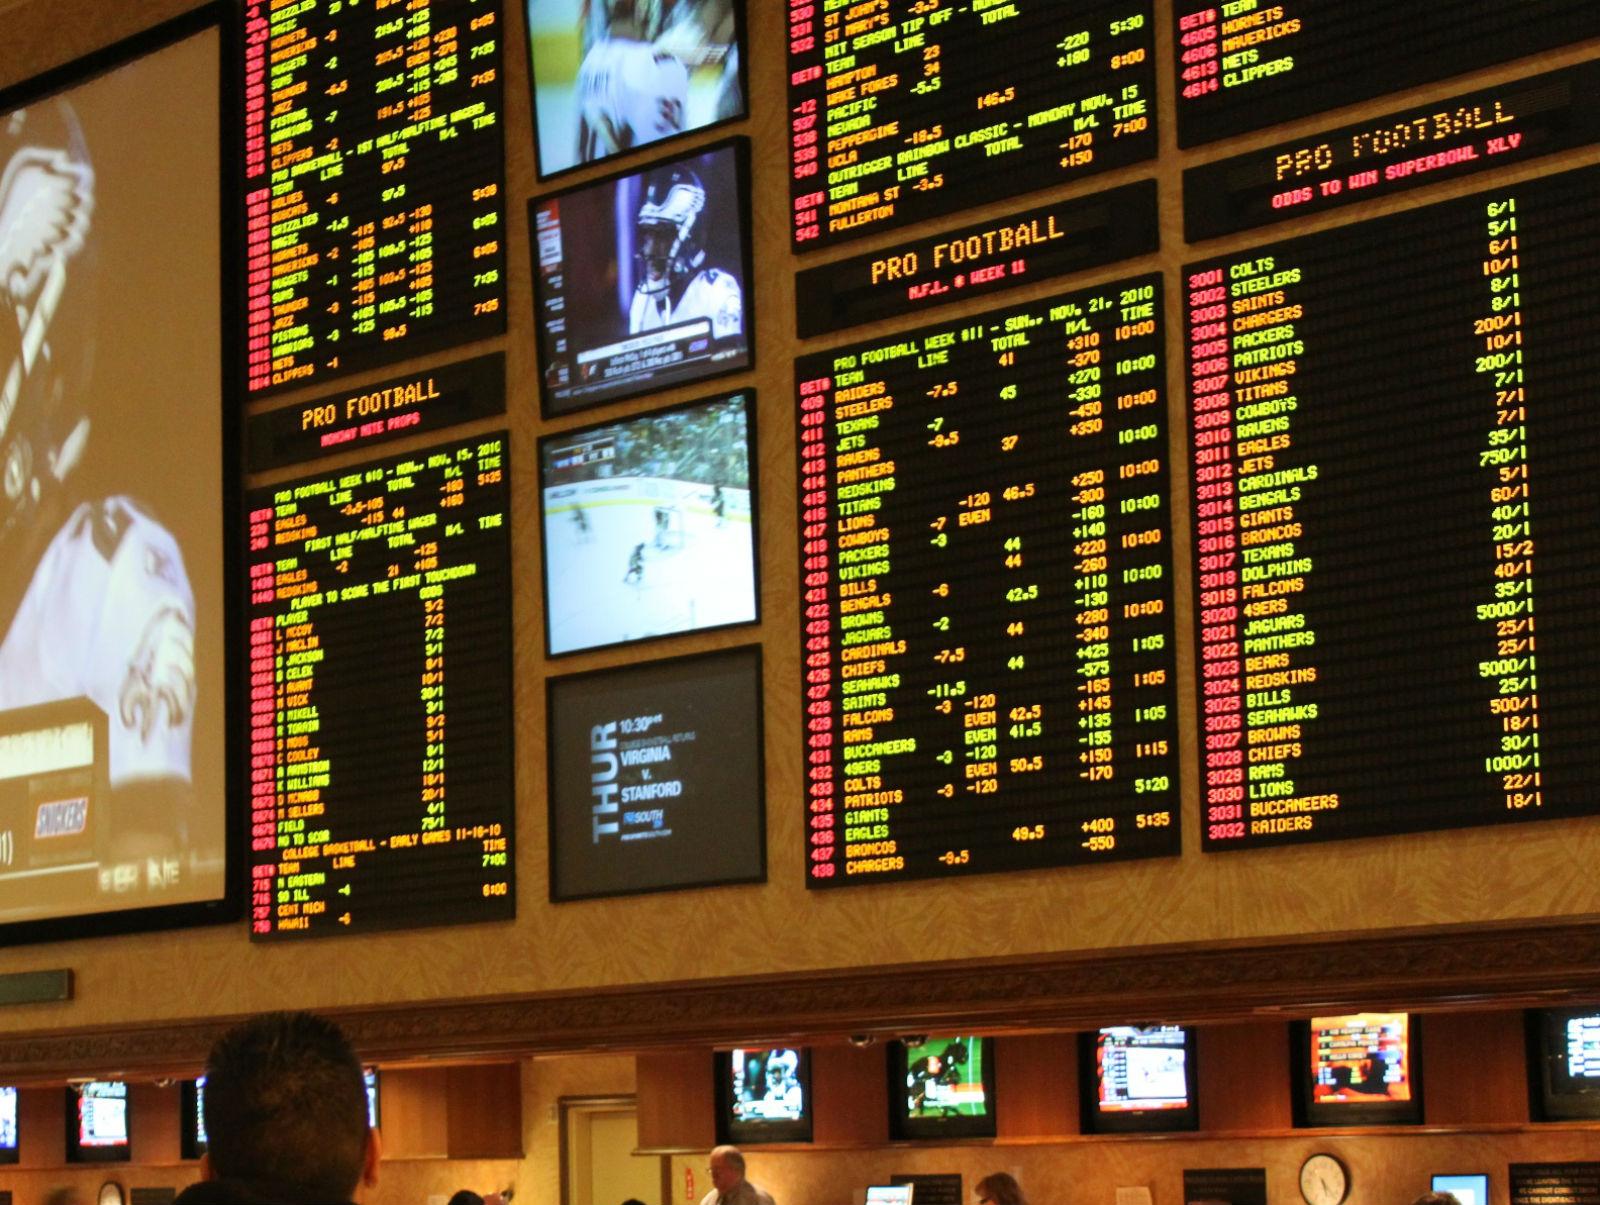 round robin betting term ats